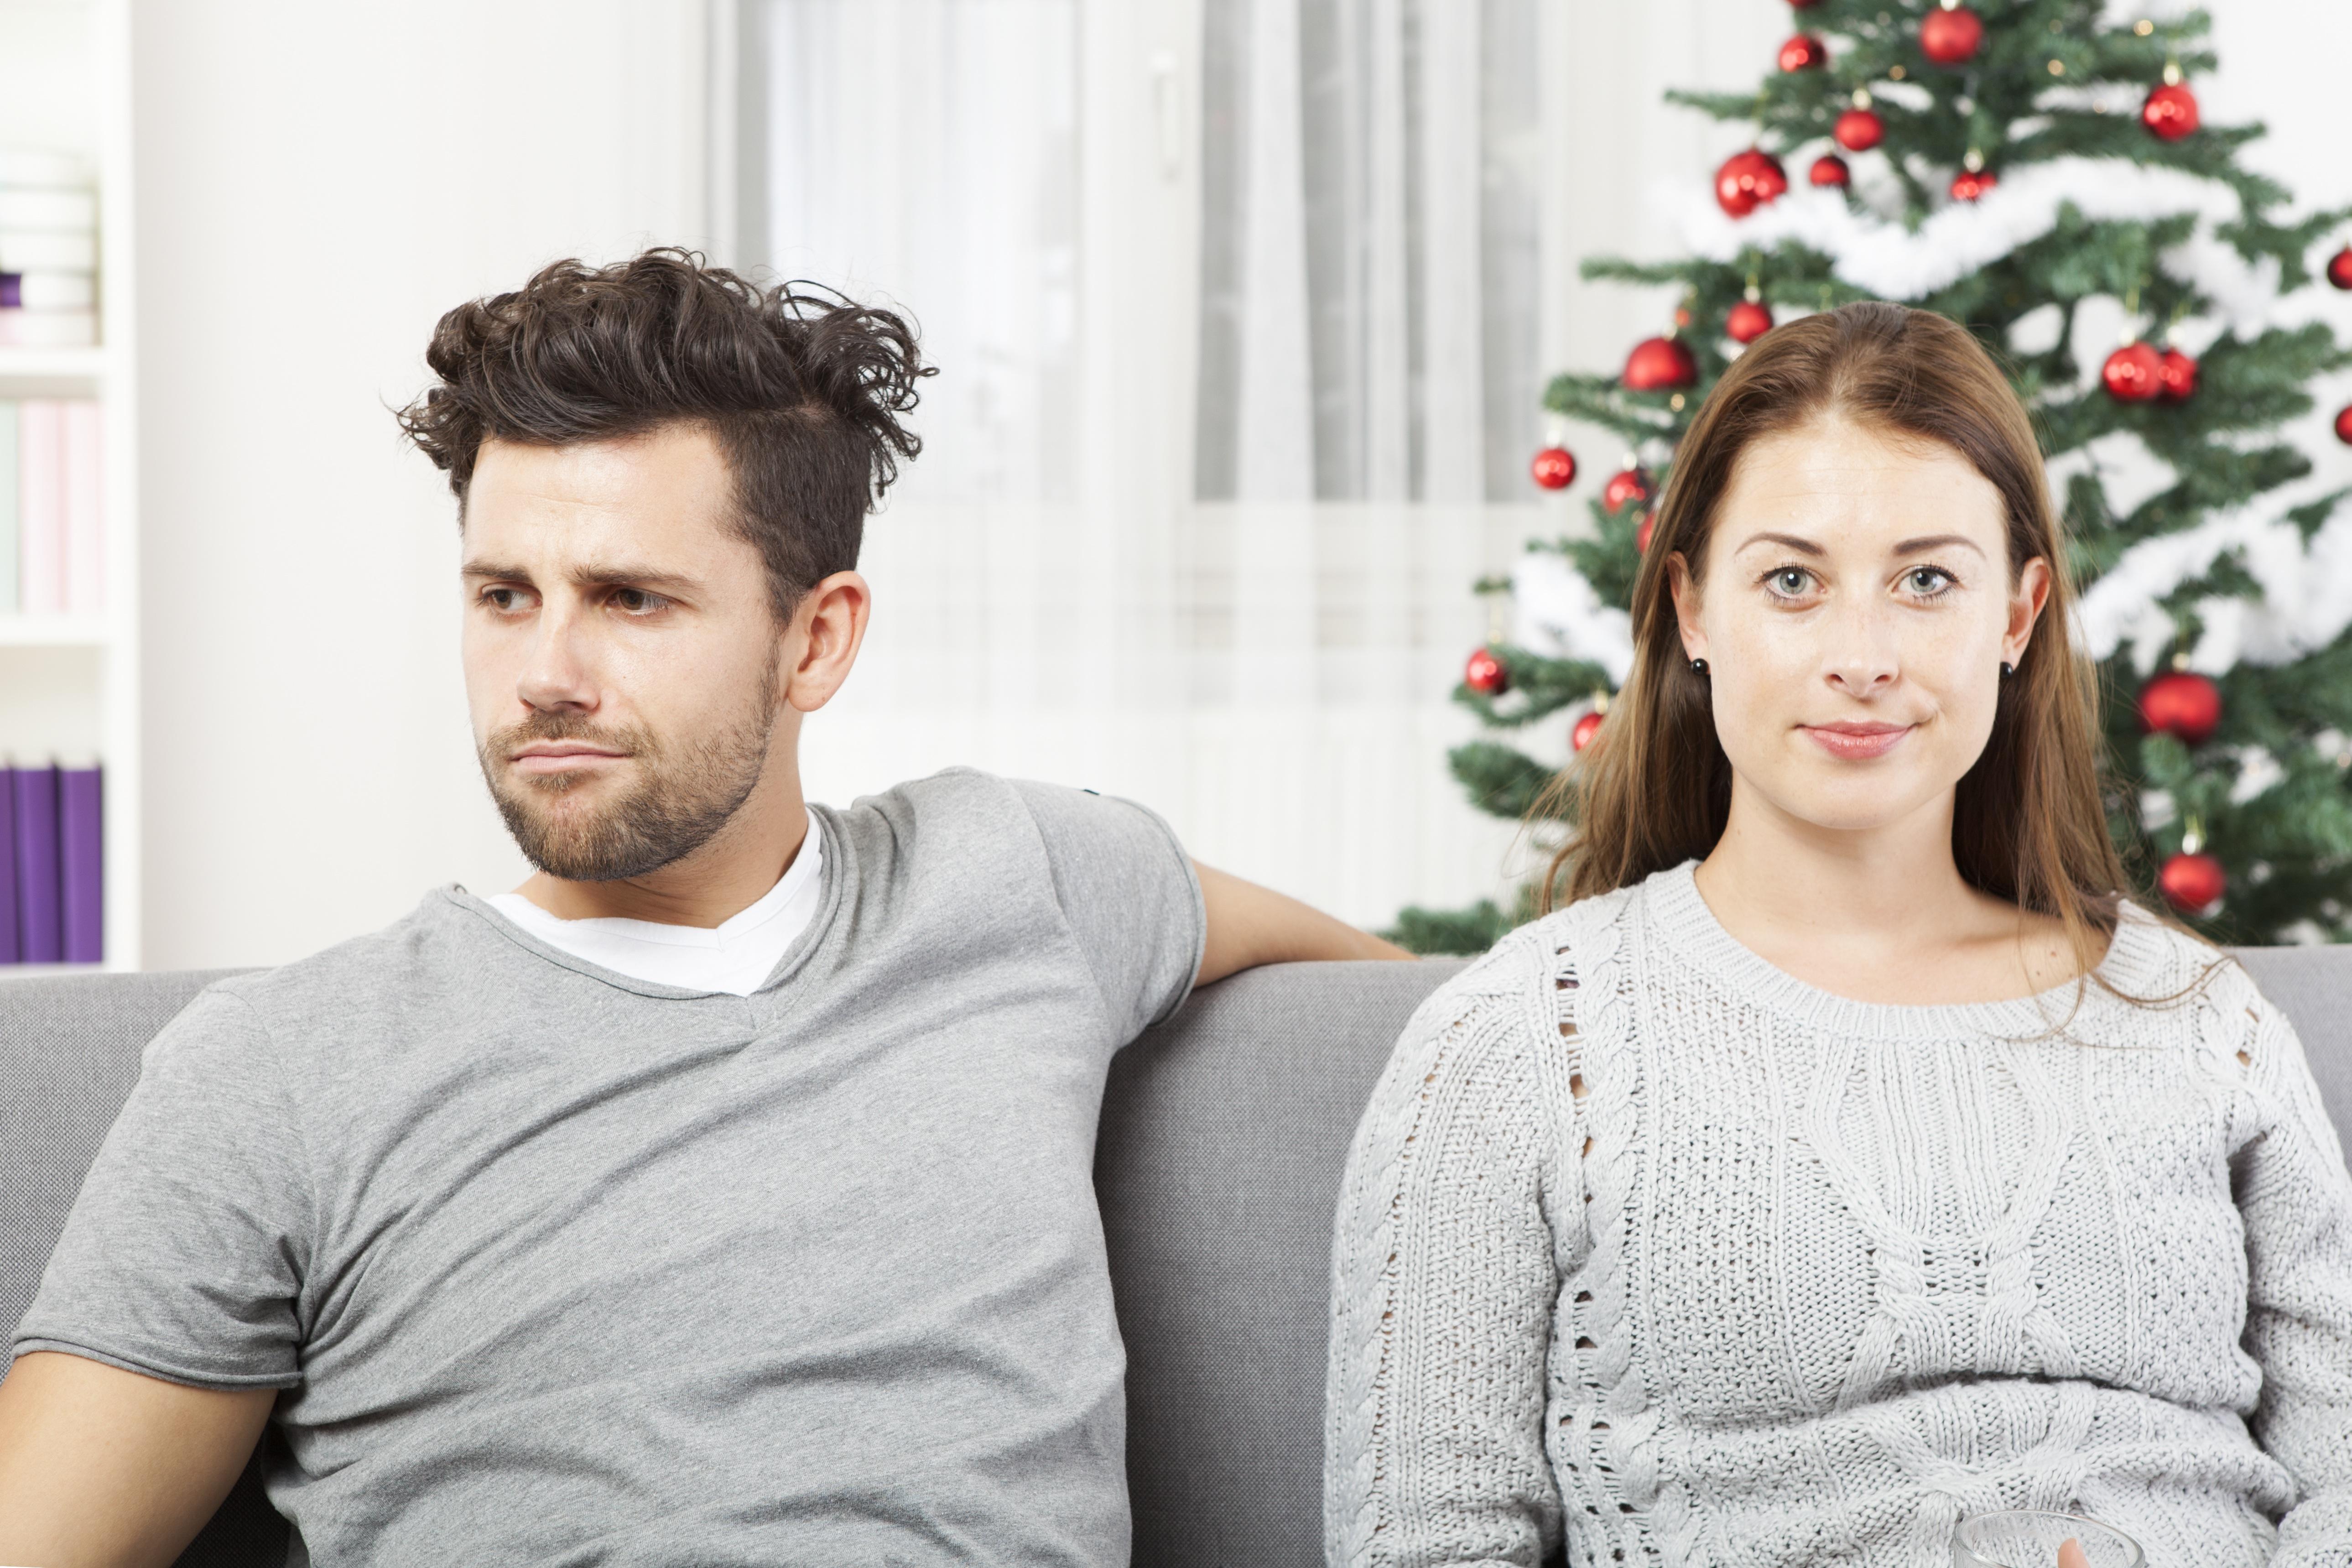 Custom Marriage vs. Living Together Essay